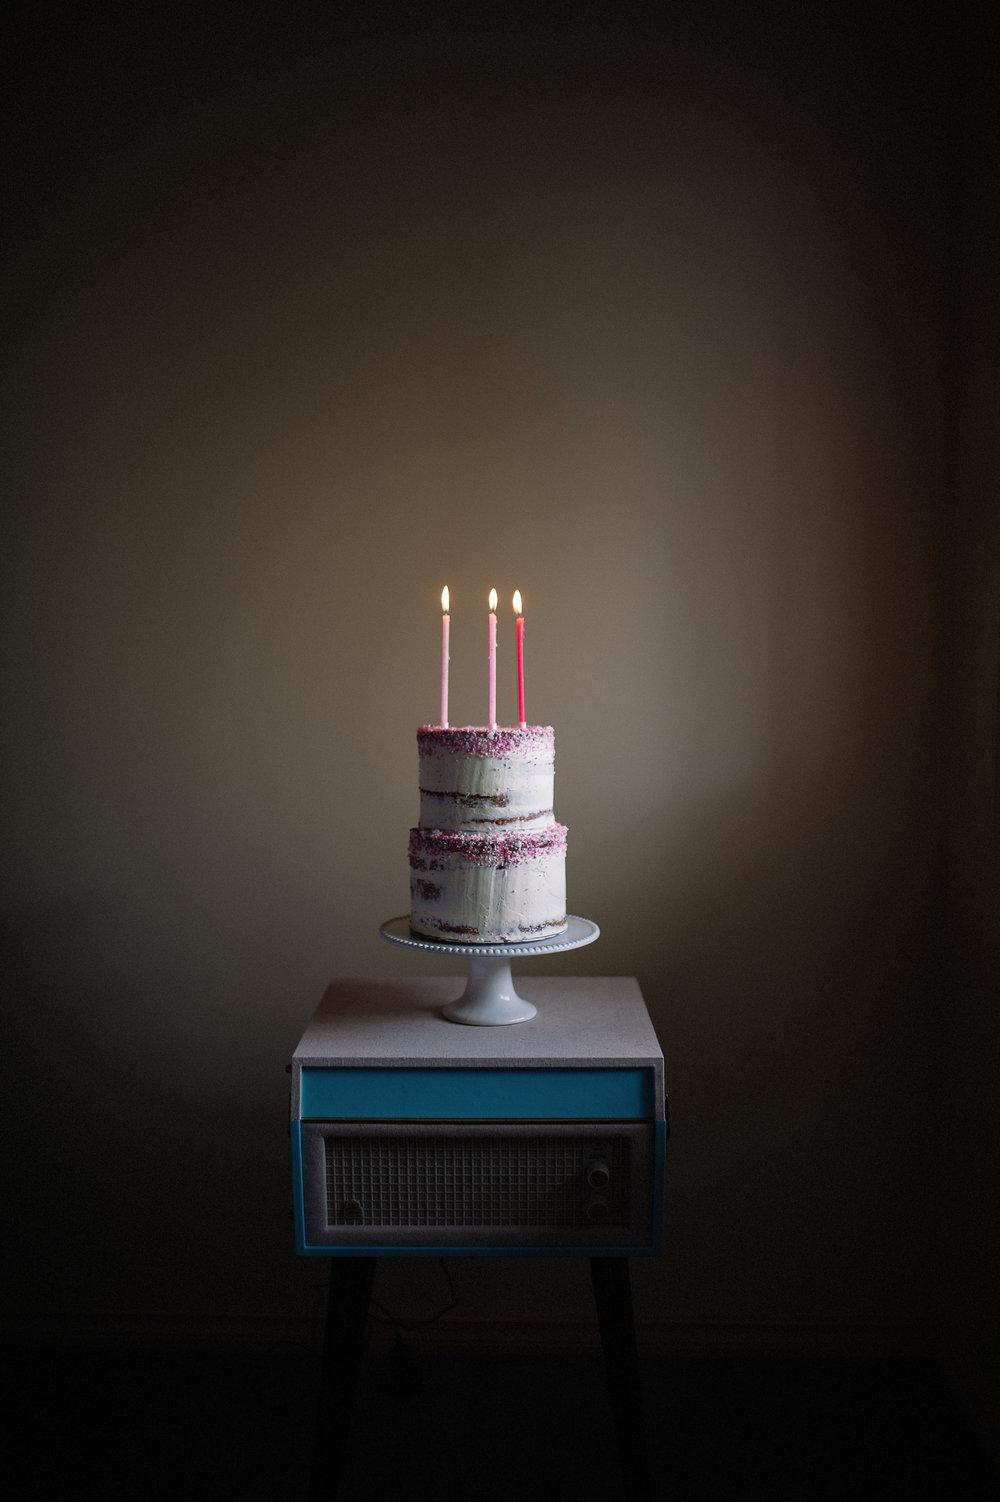 cherry-cakes-8-007.jpg